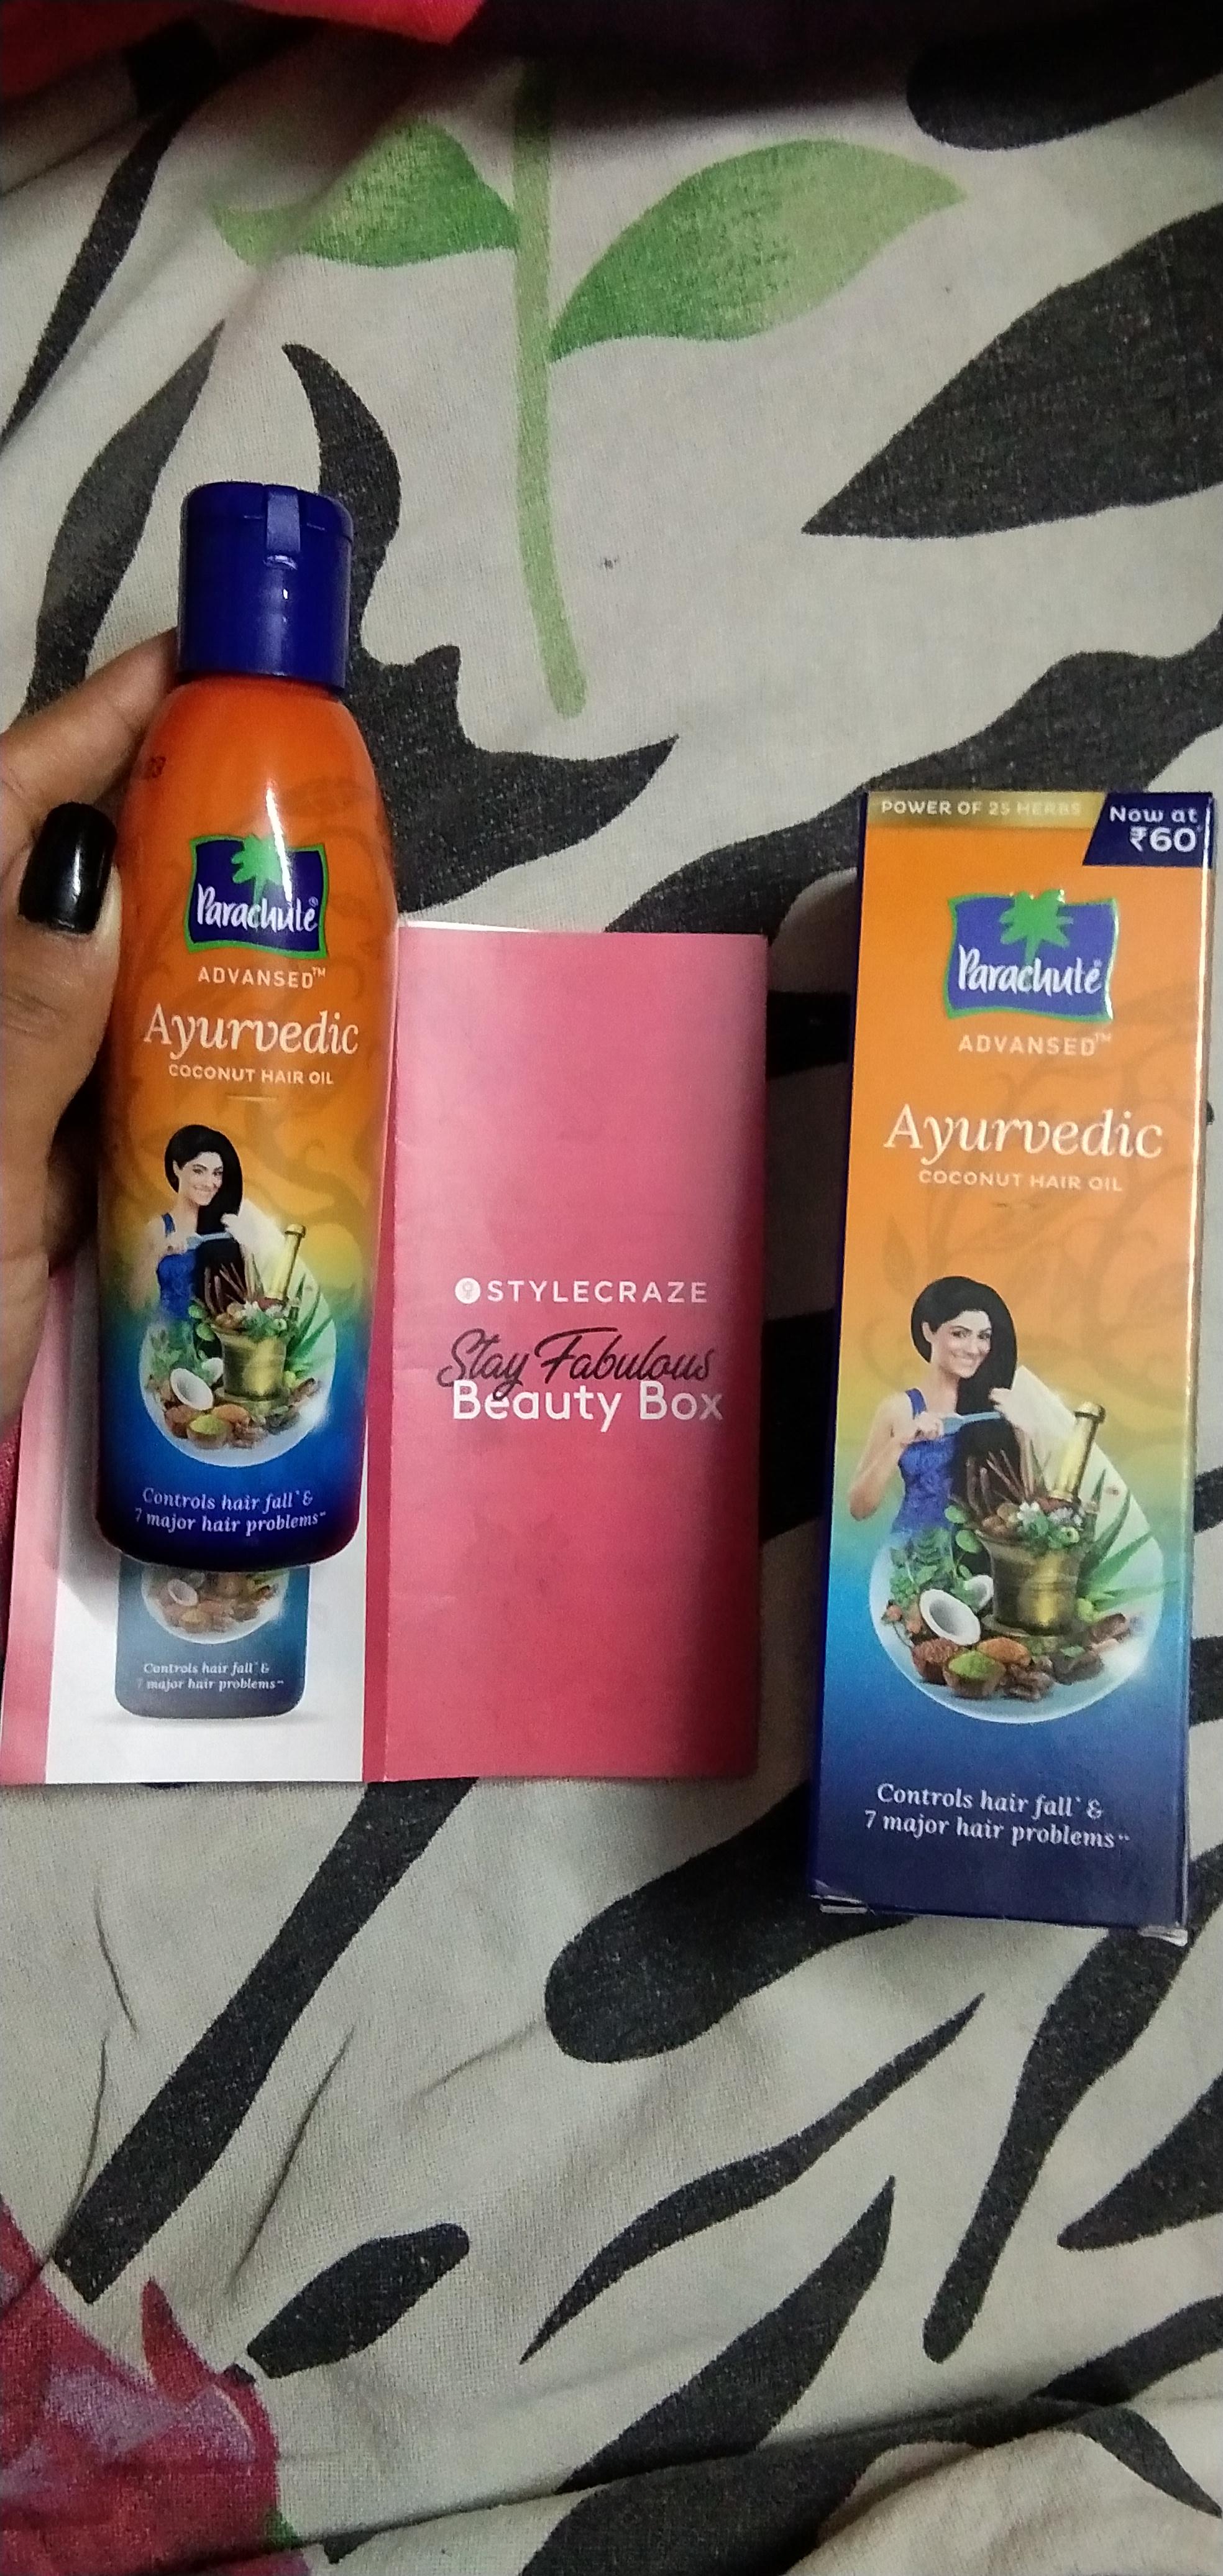 Parachute Advansed Ayurvedic Coconut Hair Oil-100 percent ayurvedic oil-By monisha_blessy